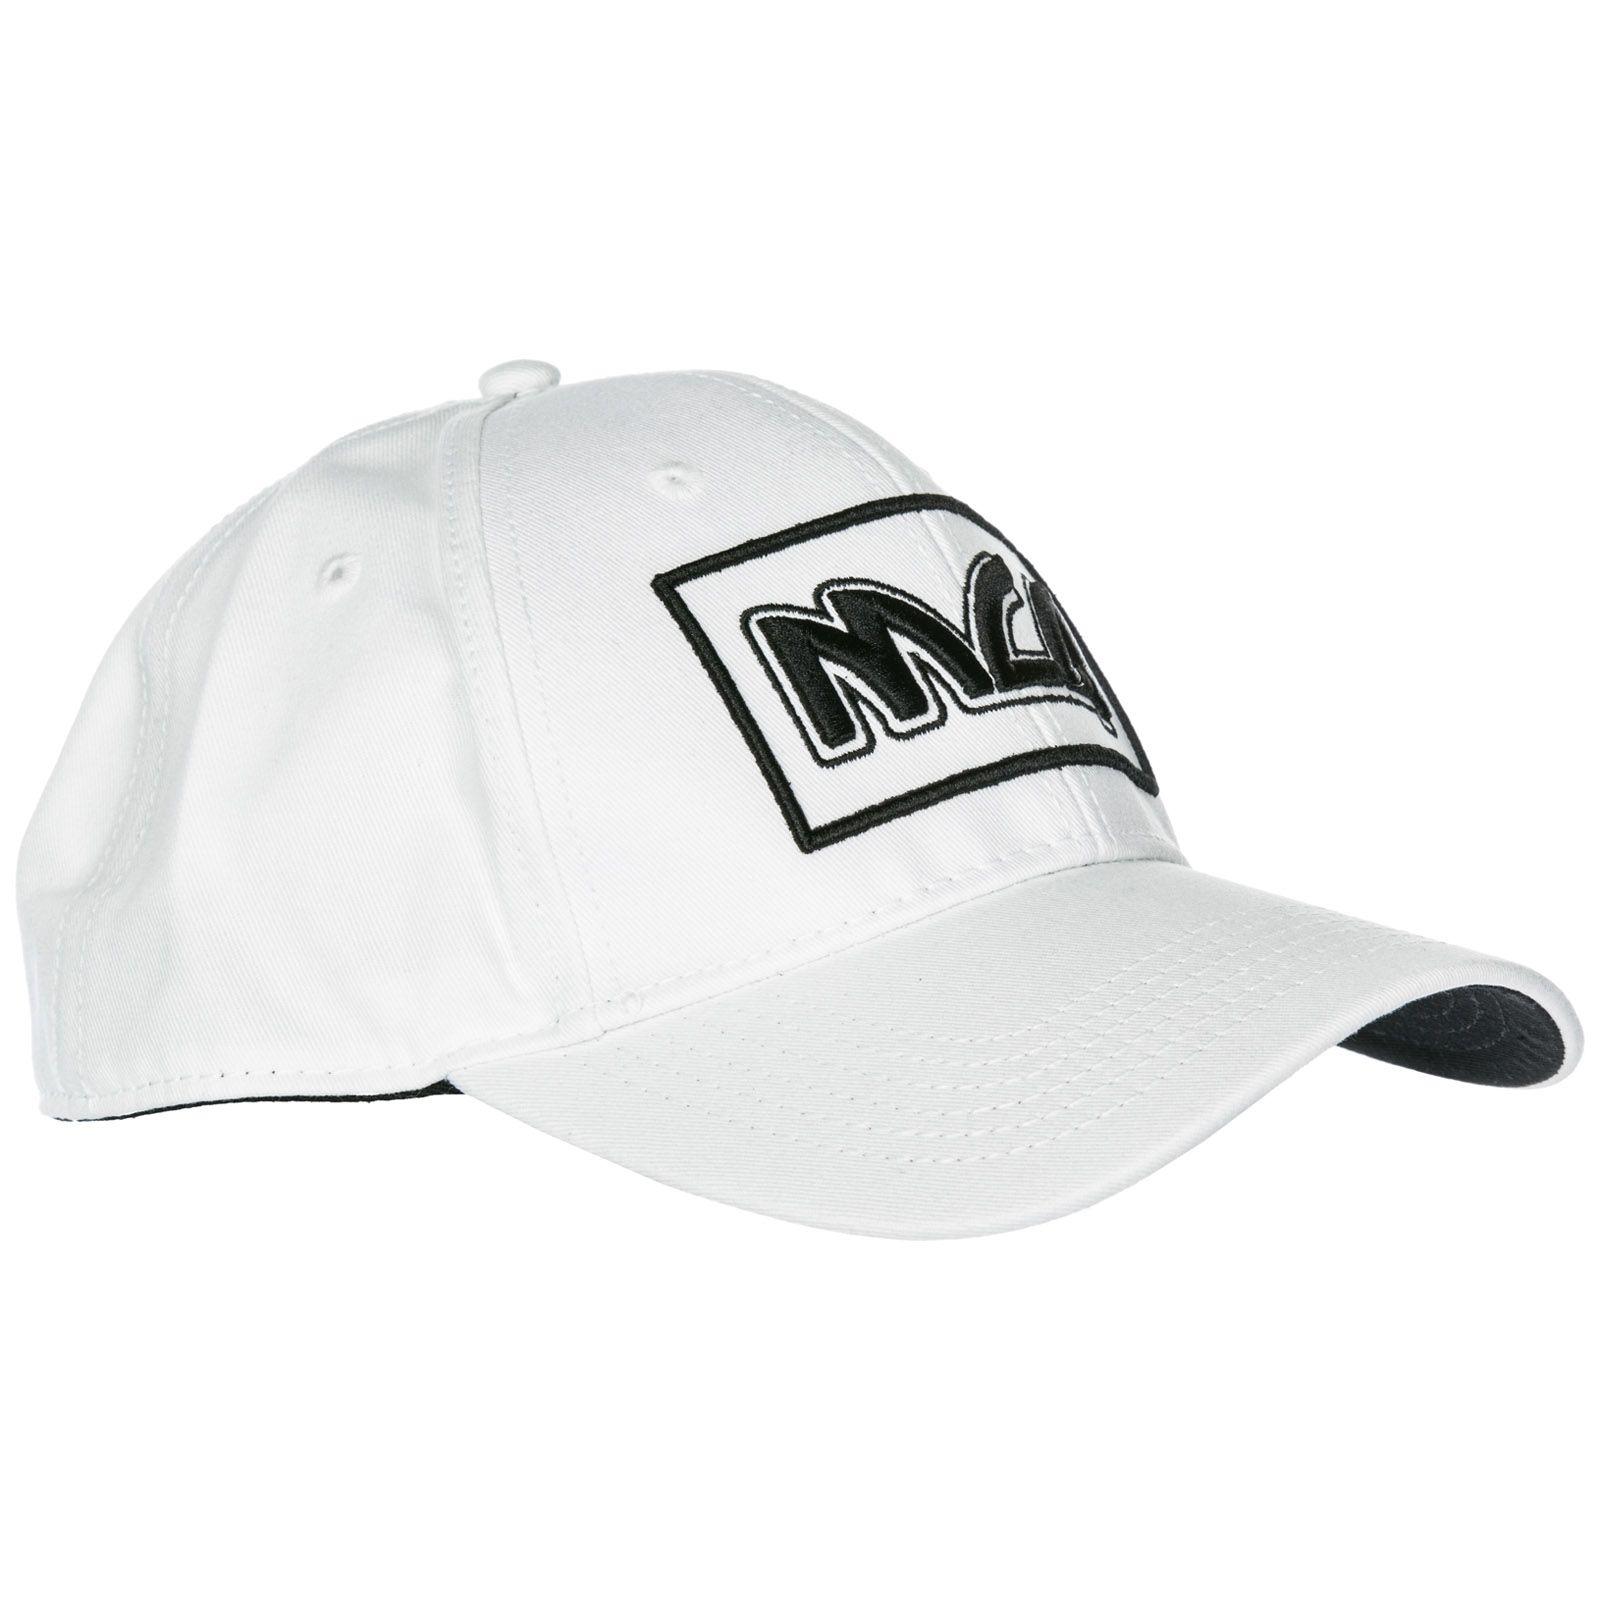 3a109695c9a55 ... McQ Alexander McQueen Adjustable Cotton Hat Baseball Cap Metal Logo -  White ...